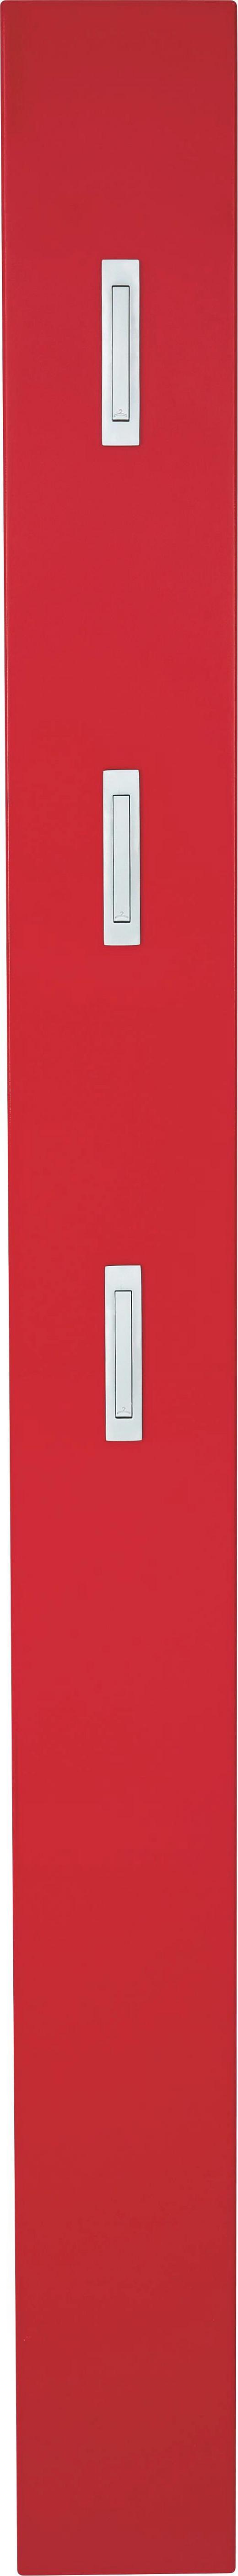 GARDEROBENPANEEL 15/170/4 cm - Rot, Design, Holzwerkstoff (15/170/4cm) - Xora